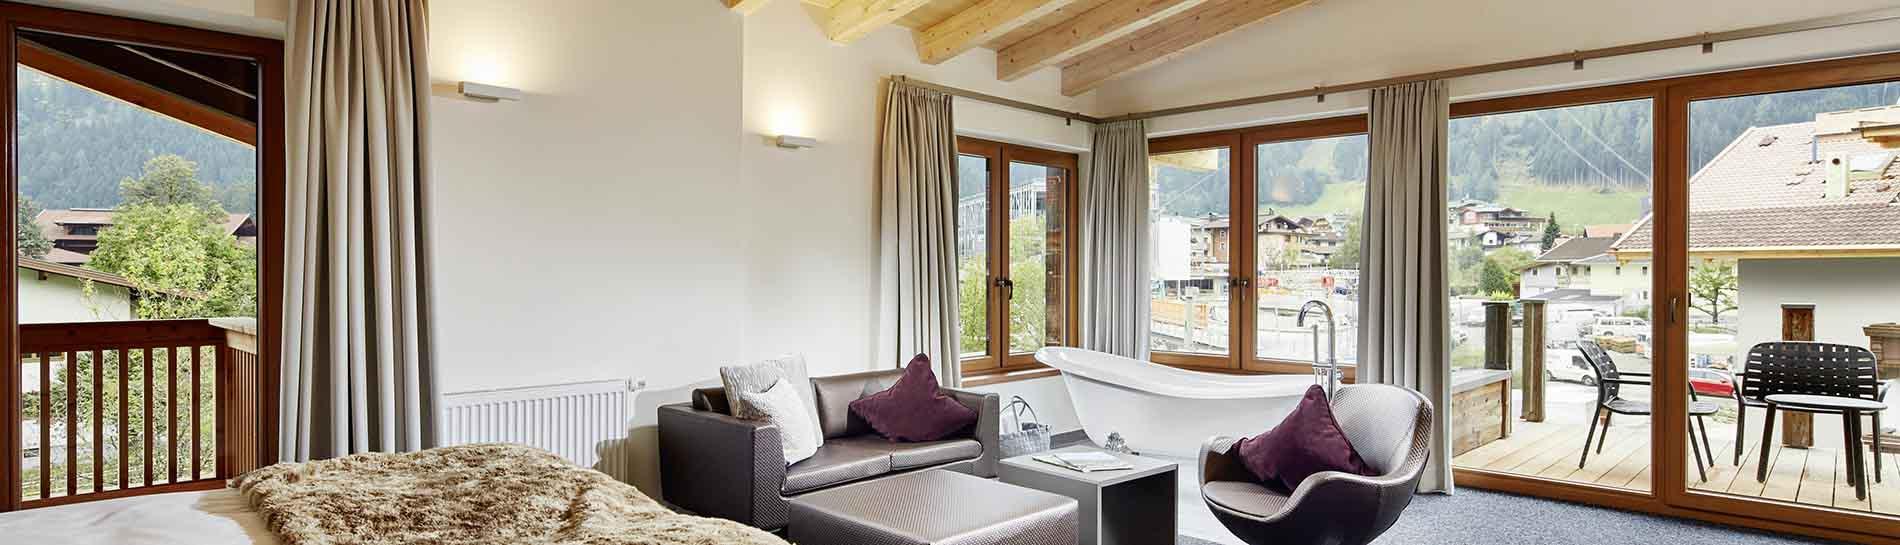 HUBERS Boutiquehotel Mayrhofen Zillertal Tyrol Austria